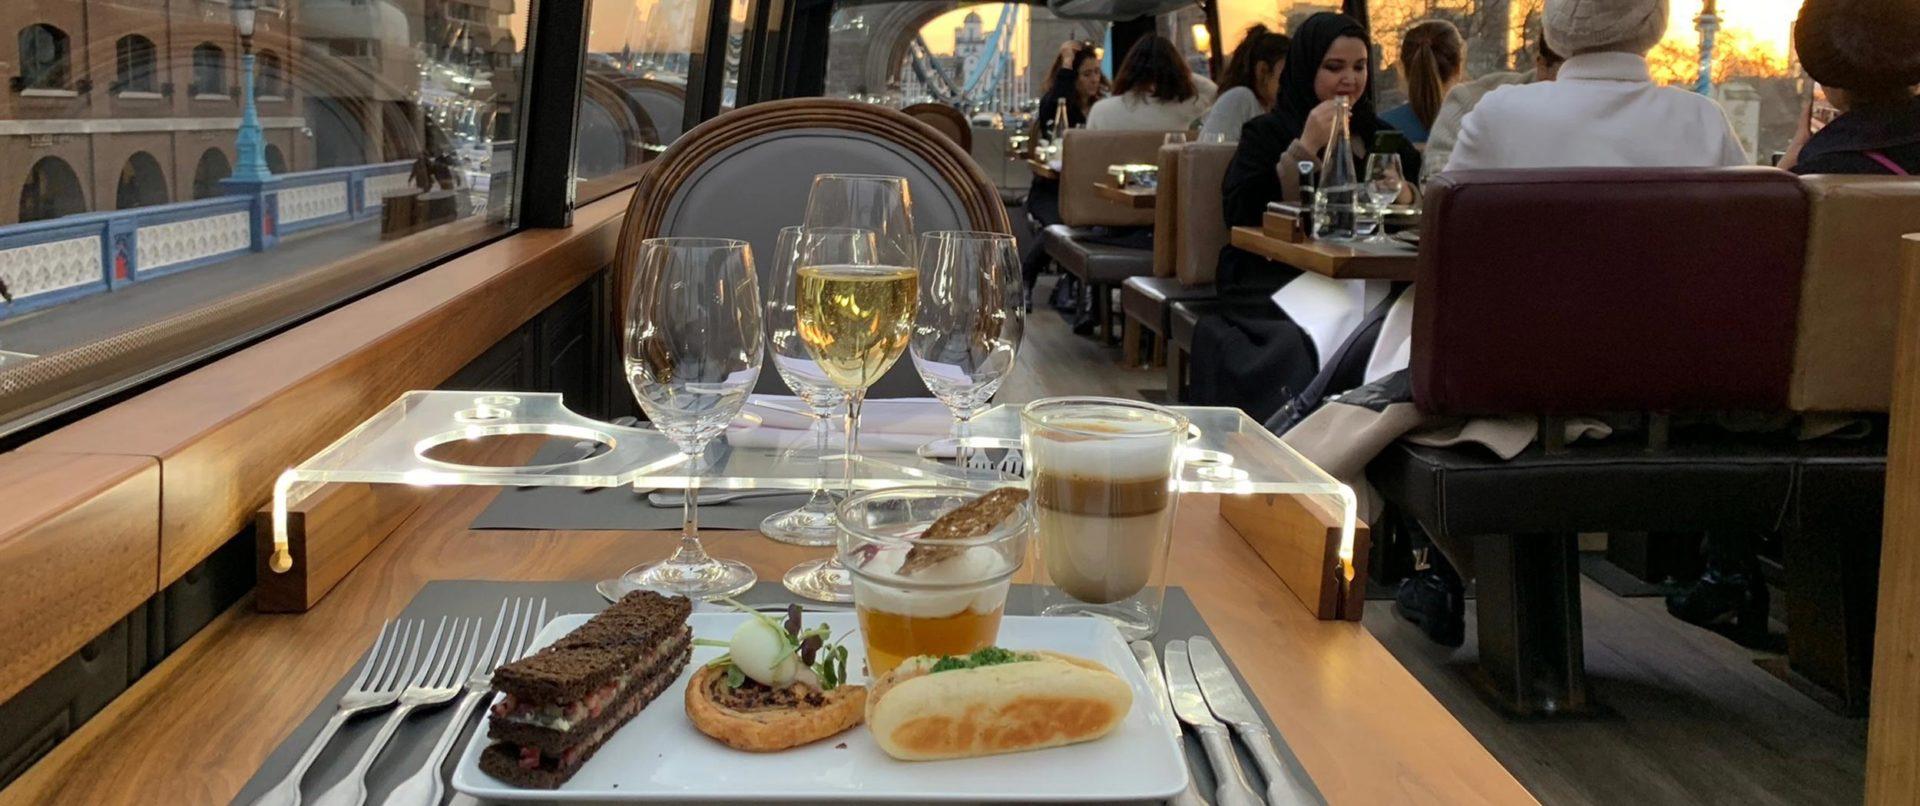 Bustronome-experience-lunch-paris